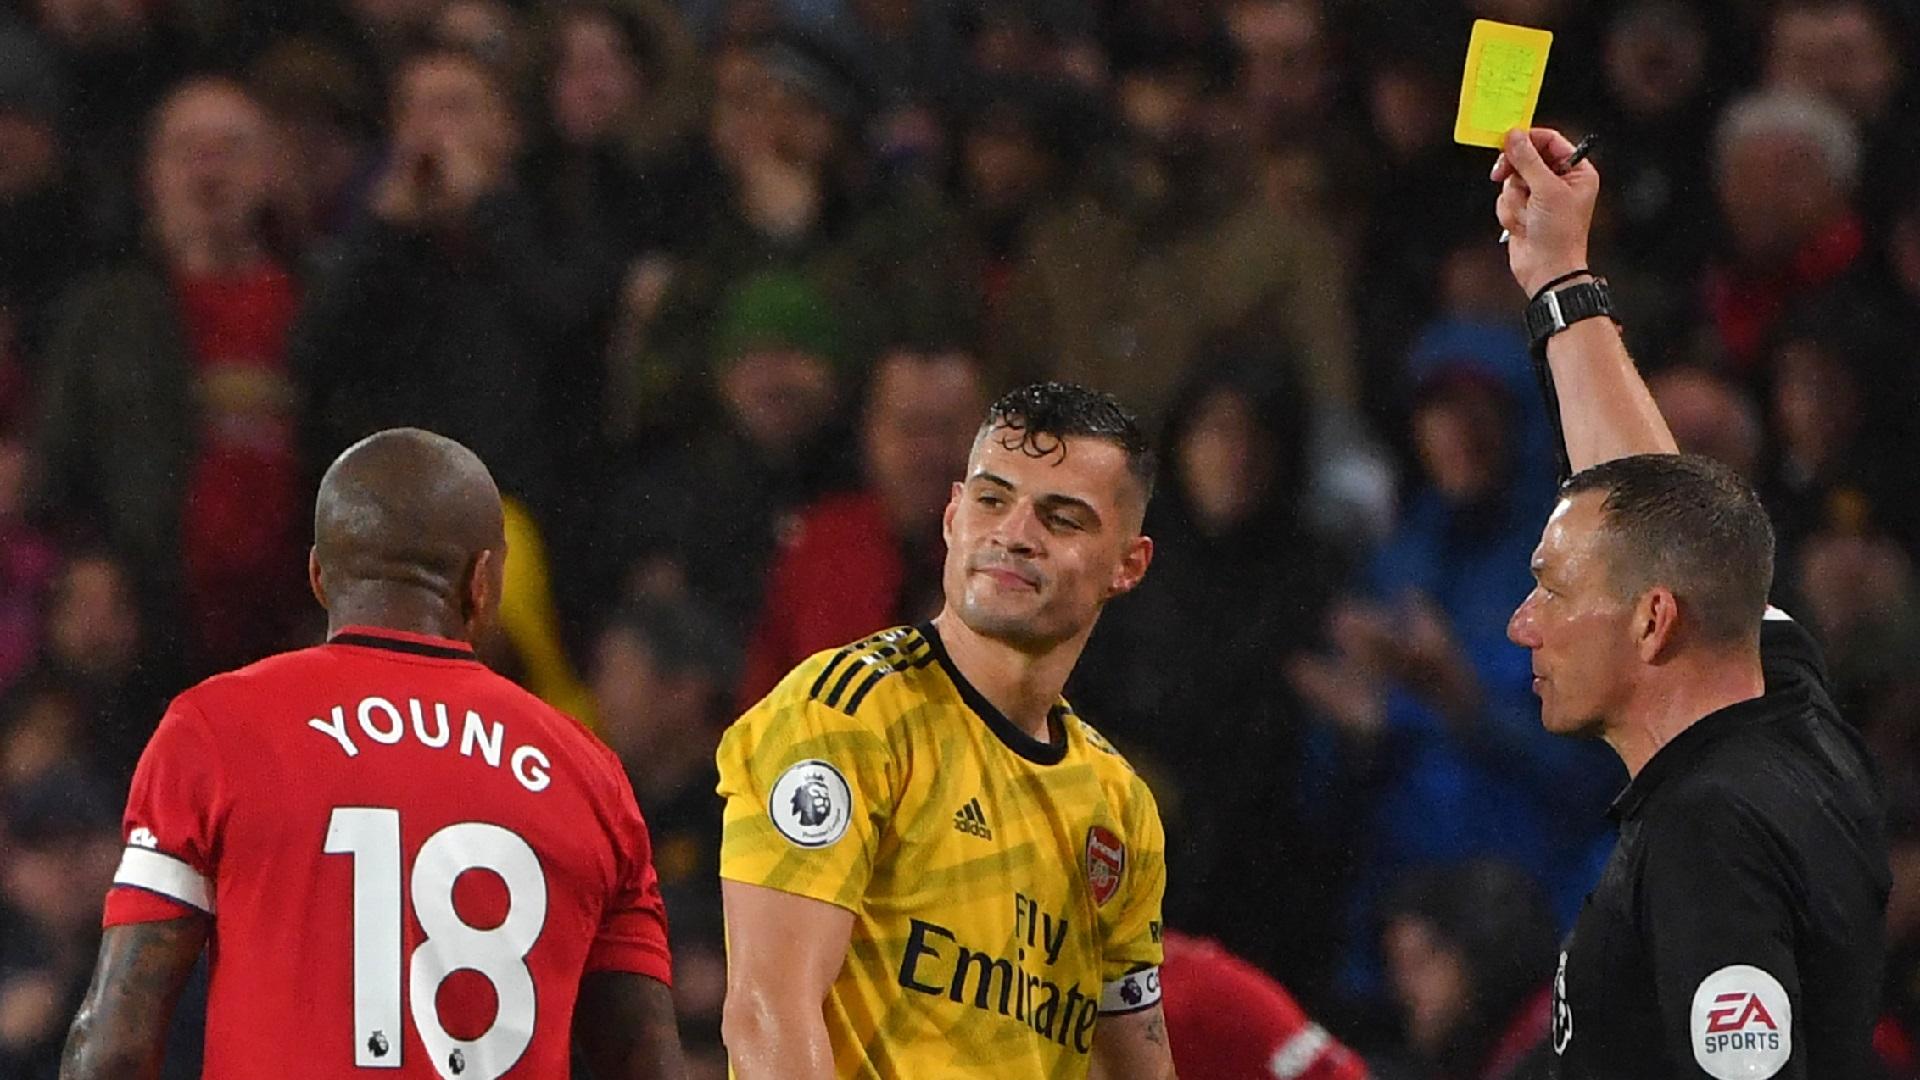 Ashley Young Granit Xhaka Manchester United Arsenal 2019-20